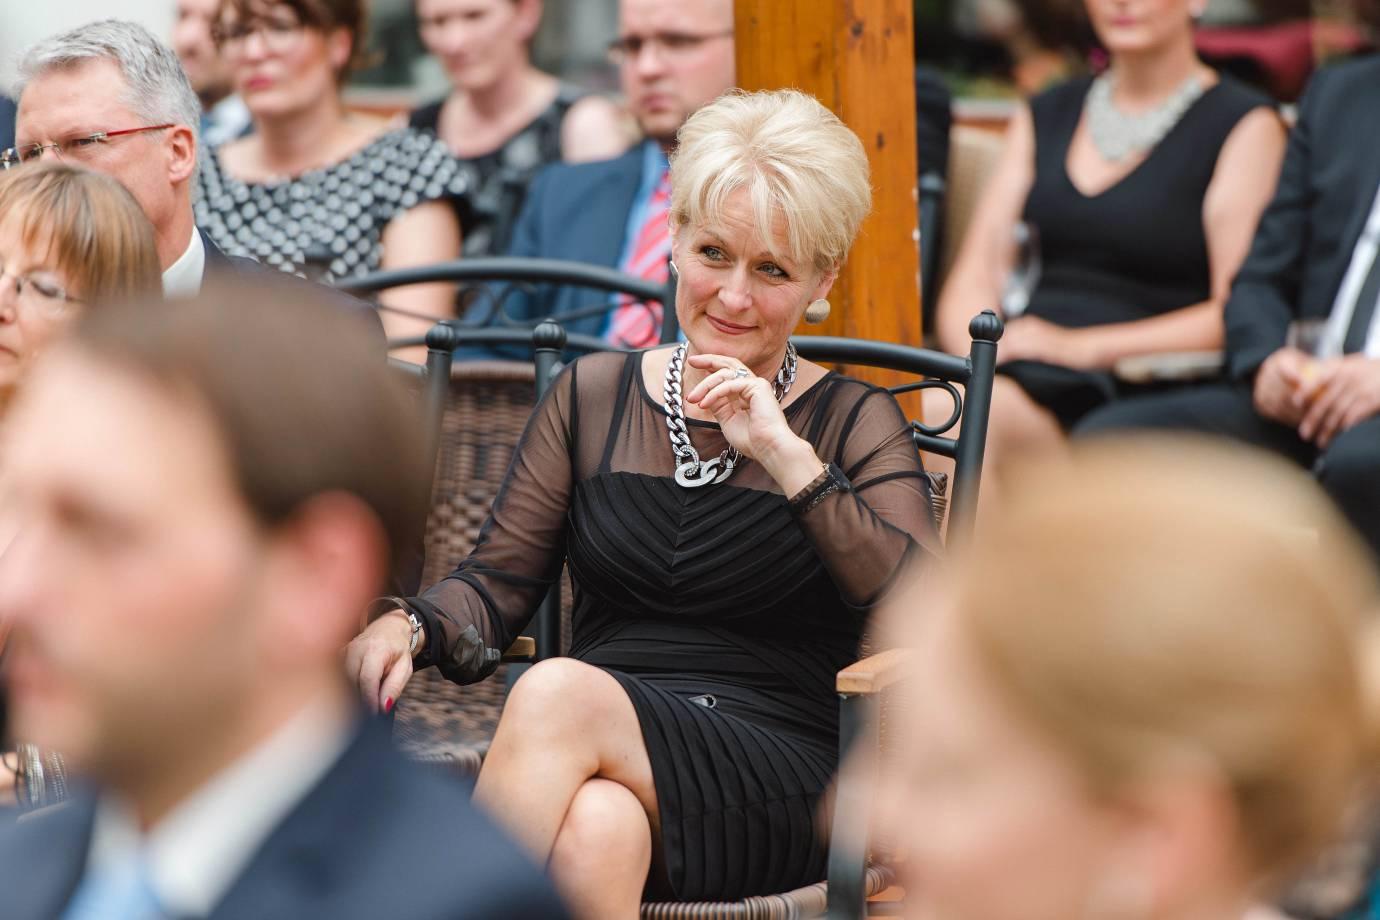 hochzeitsfotograf ganderkesee 069 - Christina+Andreas